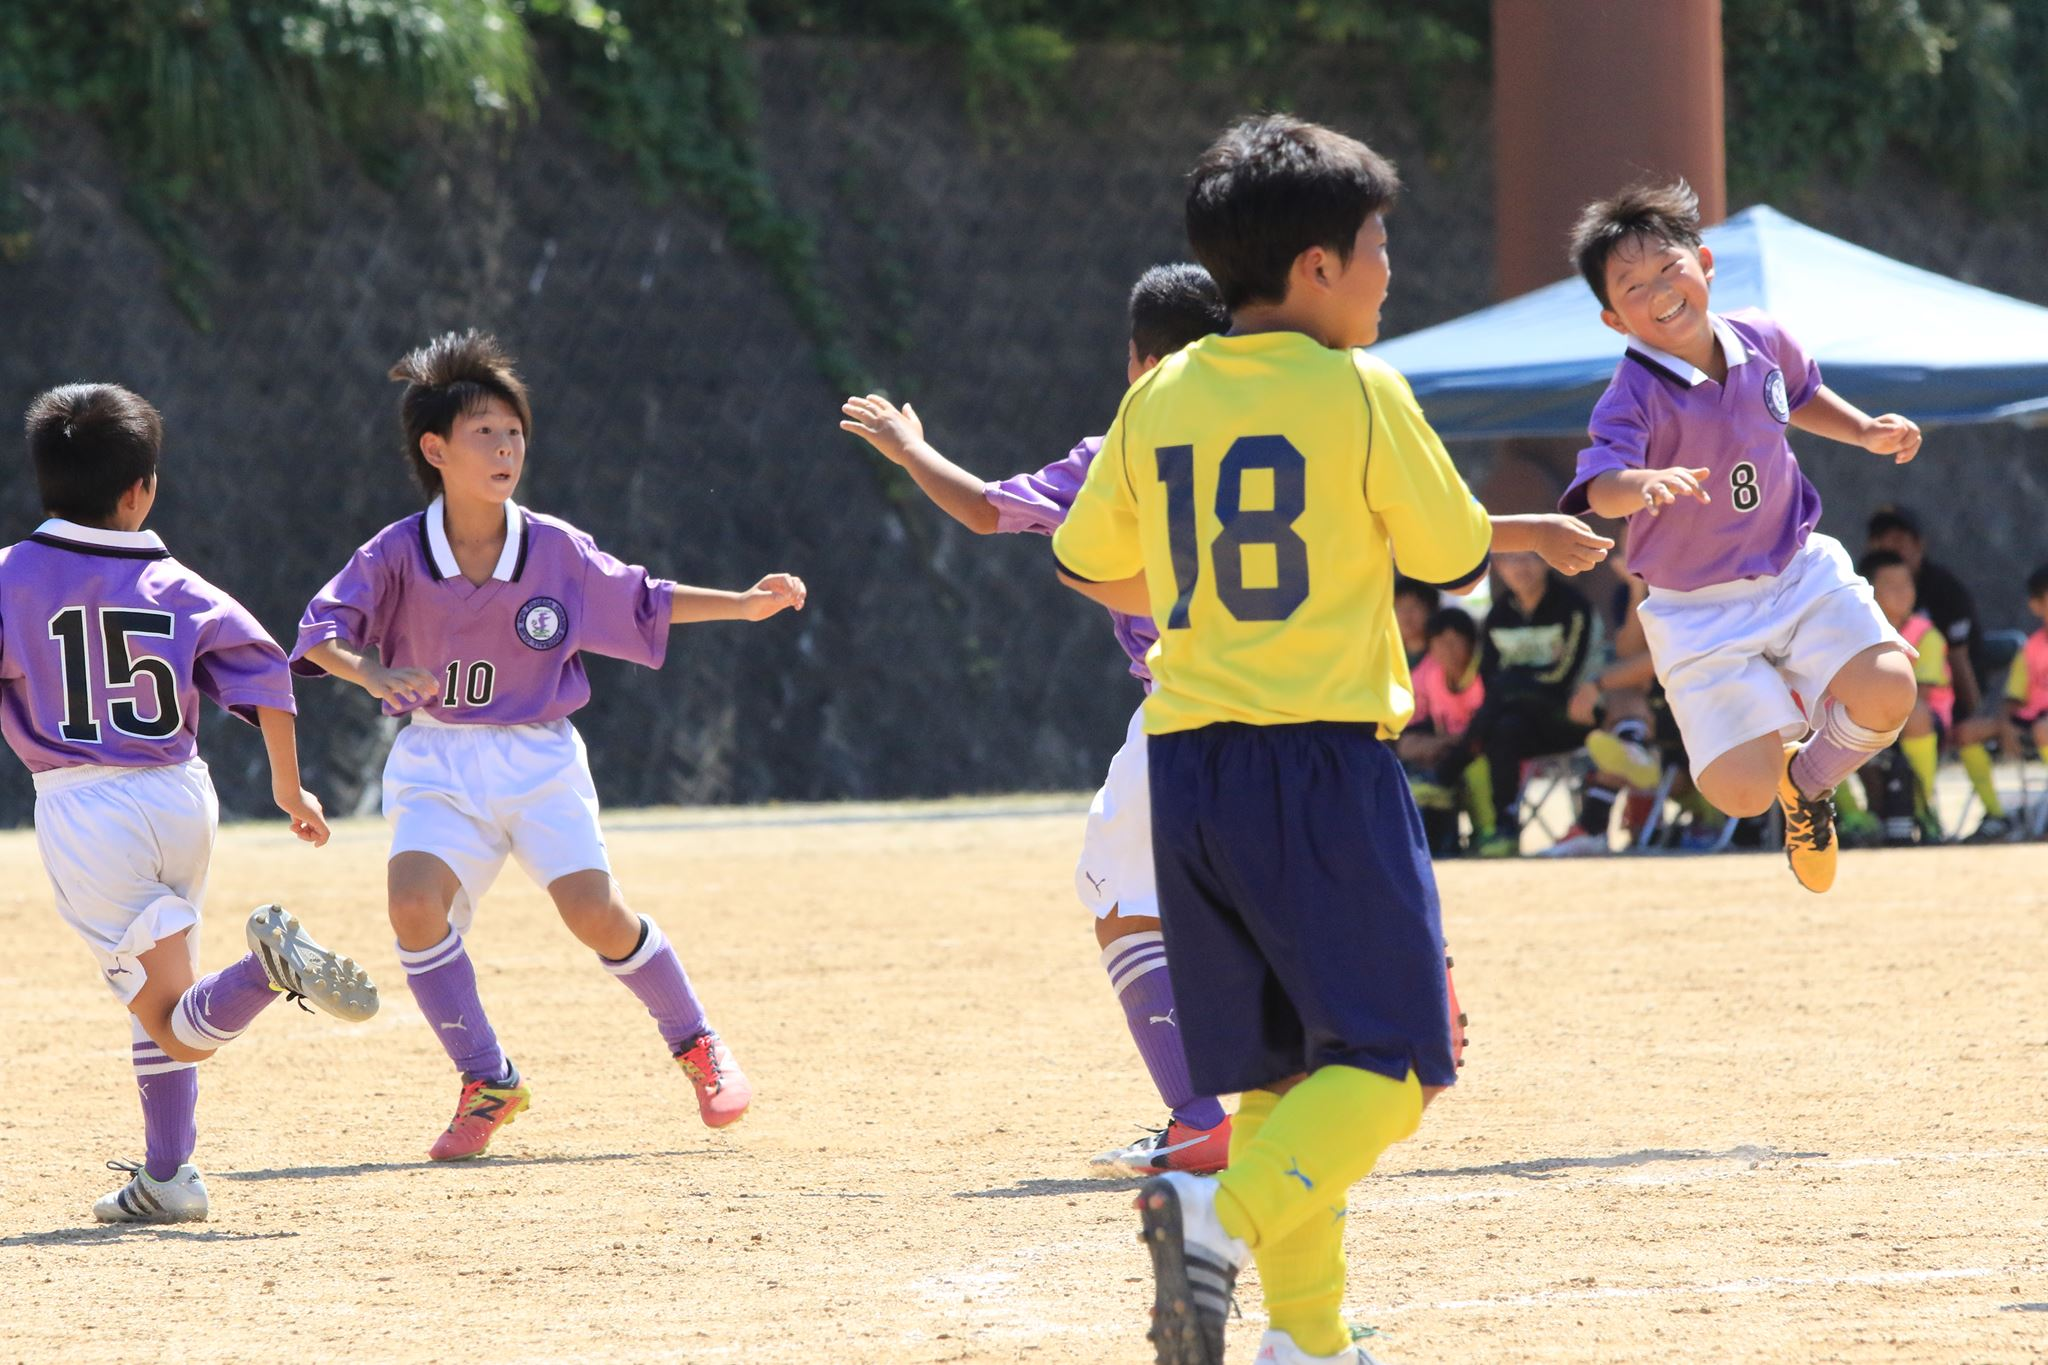 2016U10しんきんカップ中西部予選vs島田第一ゴールシーン10.jpg